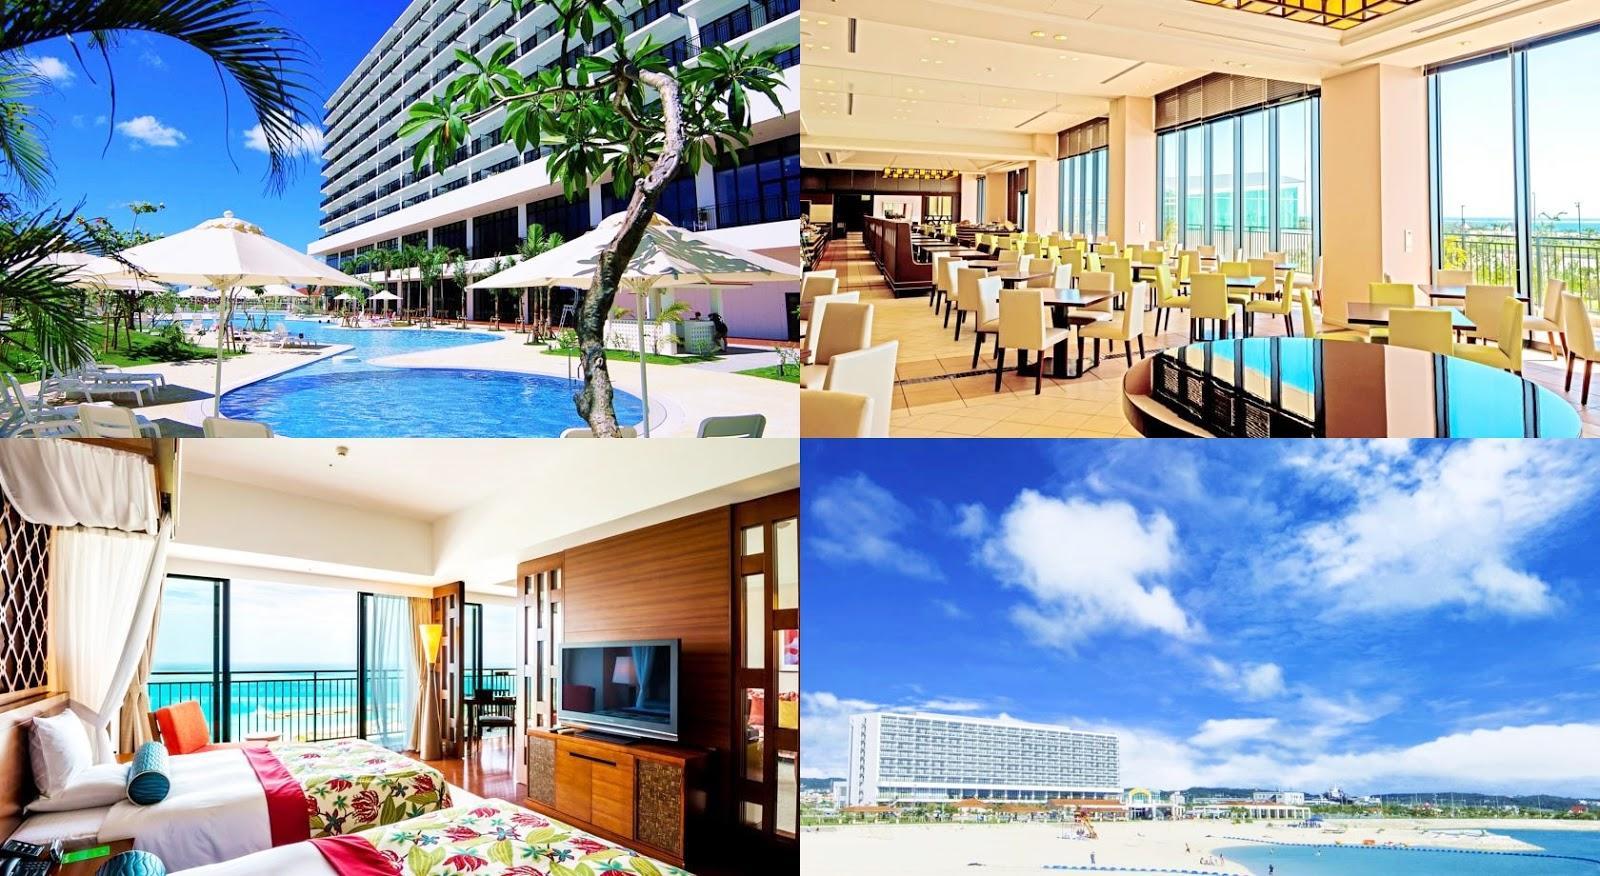 沖繩-住宿-推薦-南方海灘度假酒店-Southern-Beach-Hotel&Resort-Okinawa-hotel-recommendation